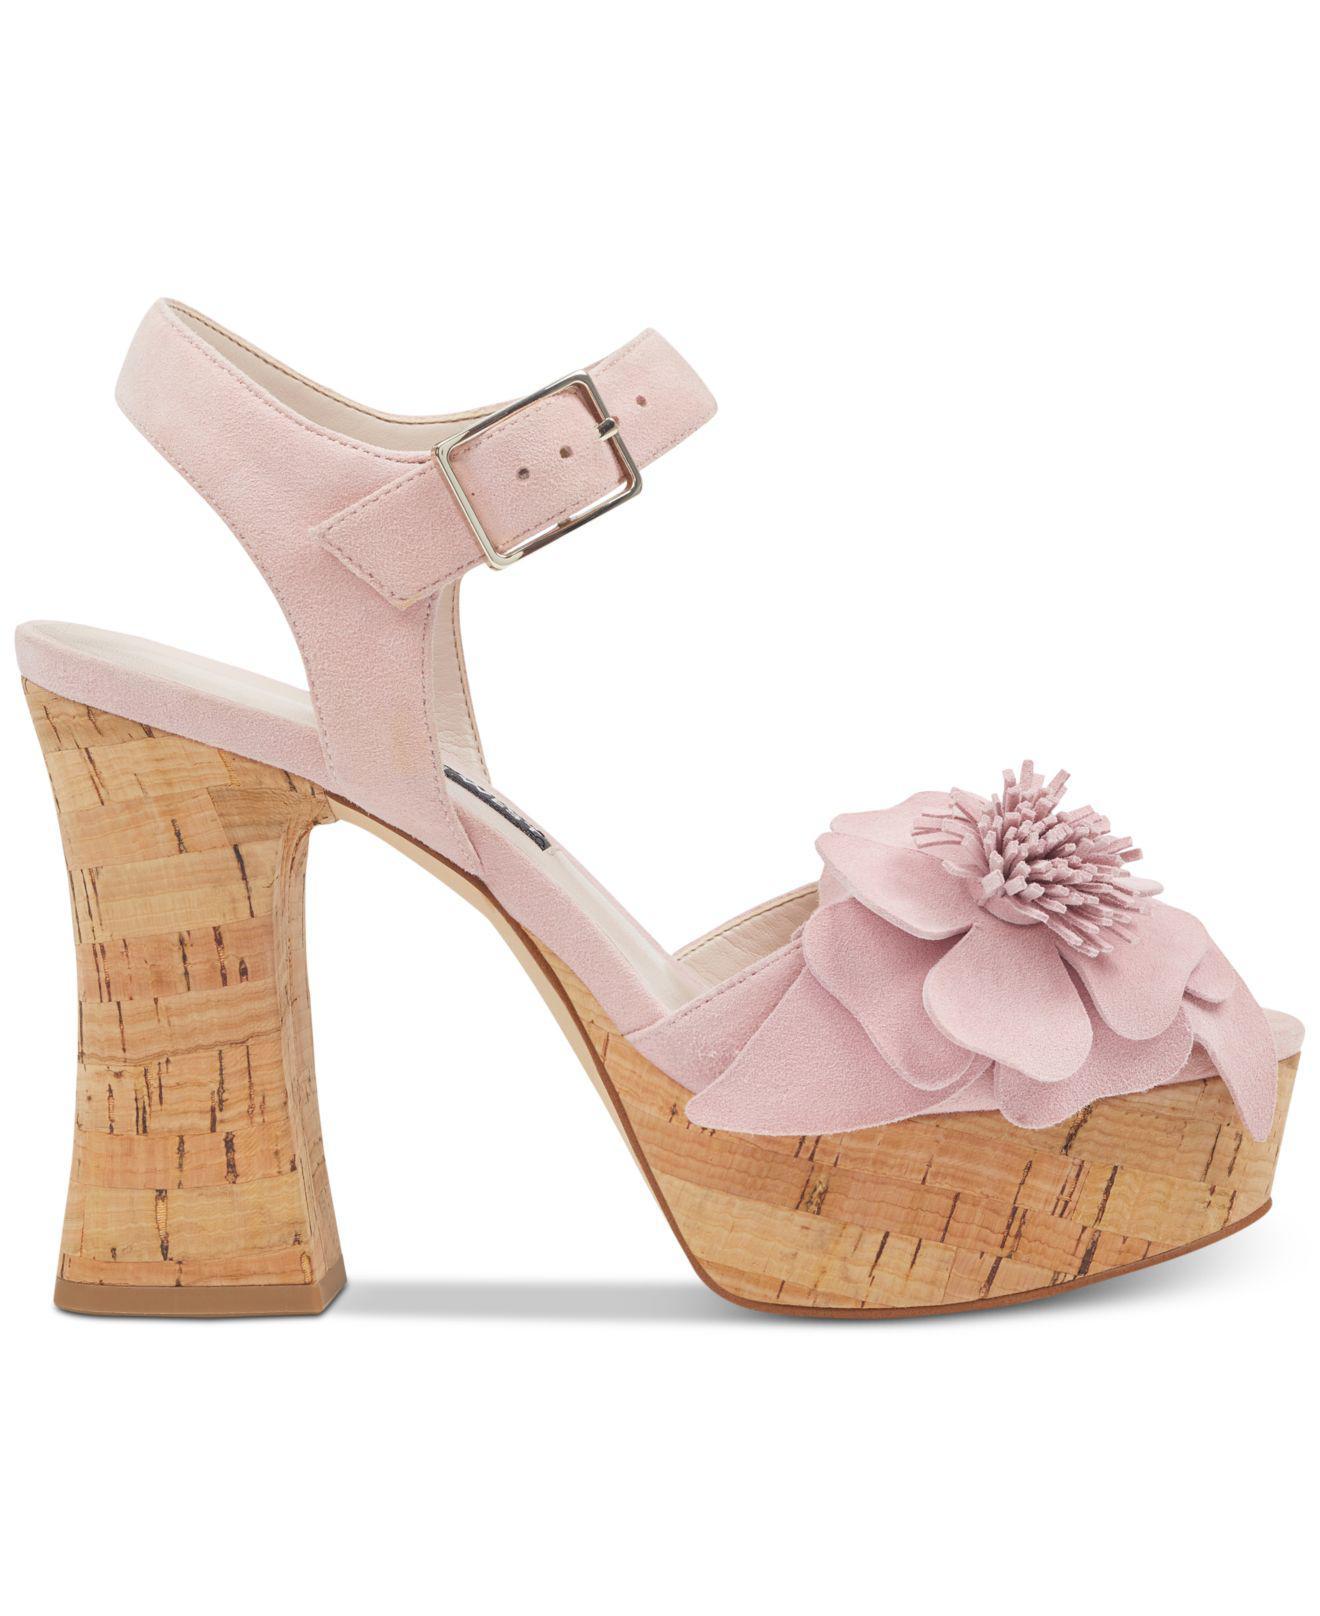 b351e86d8002 Lyst nine west winflower sandals in pink jpg 1320x1616 Pink nine west  sandals